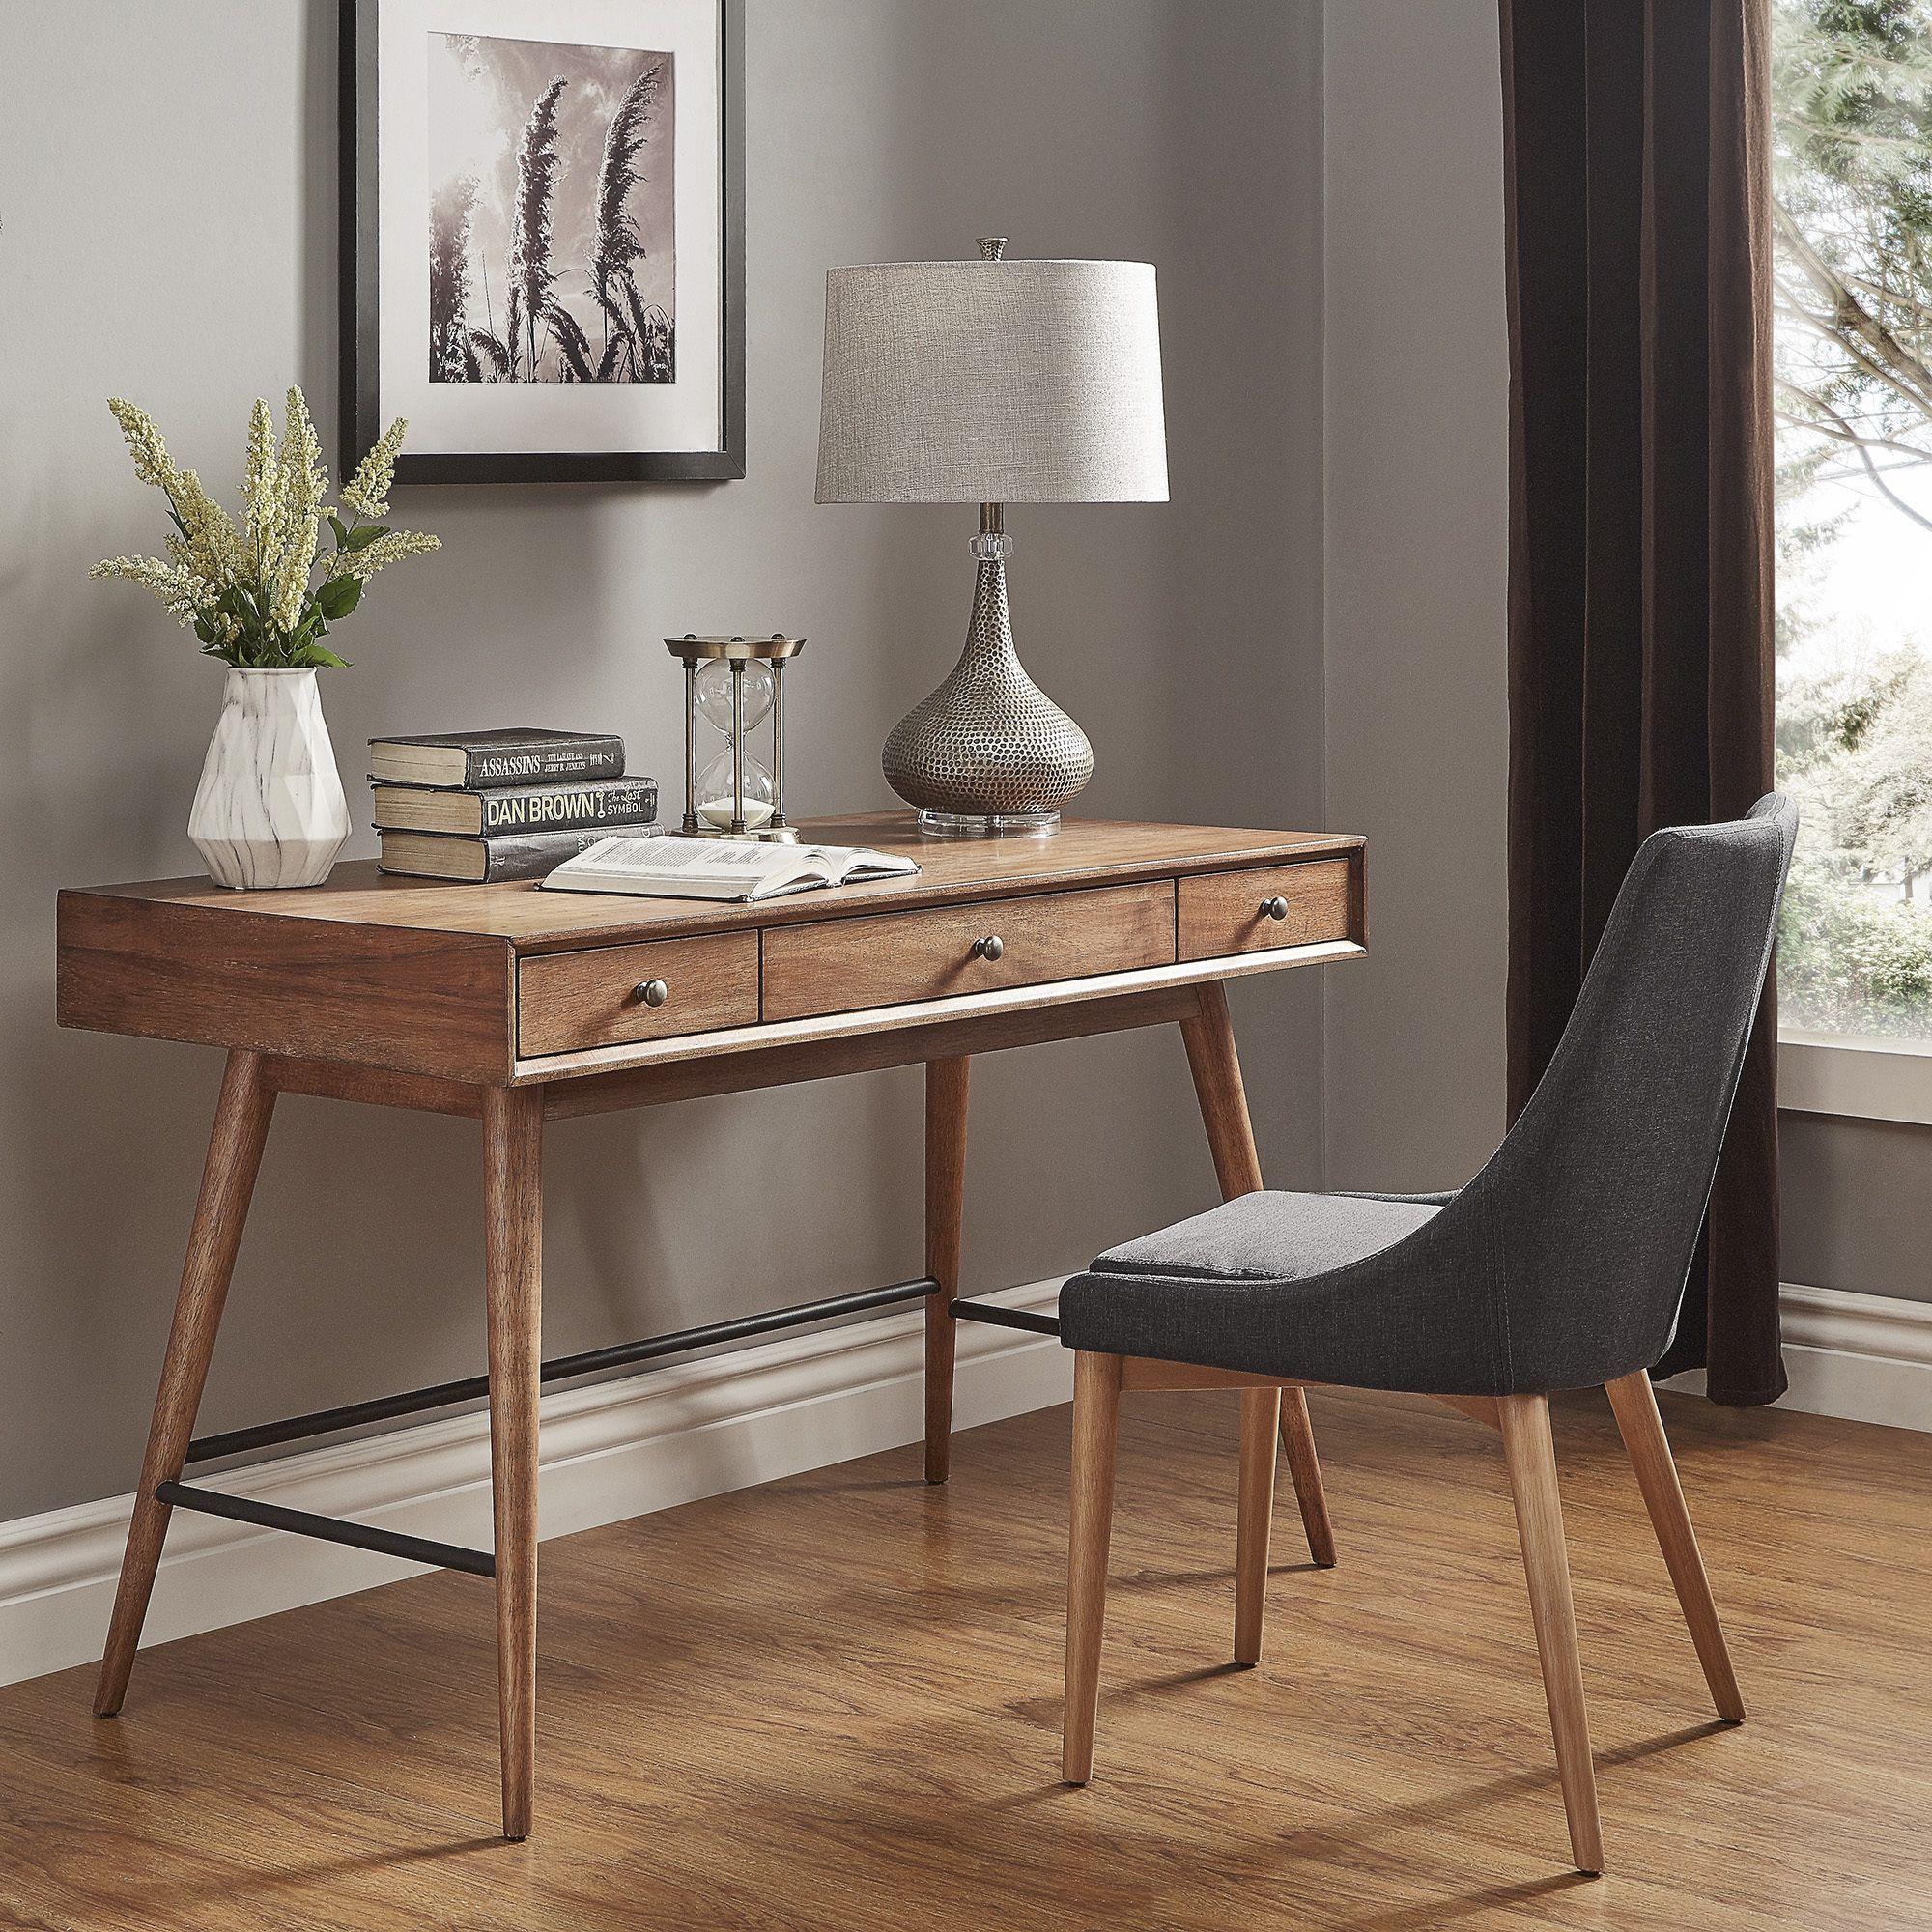 Aveiro Writing Table Modern Teak Wood Writing Desks Malaysia Desk In Living Room Cheap Office Furniture Home Office Furniture